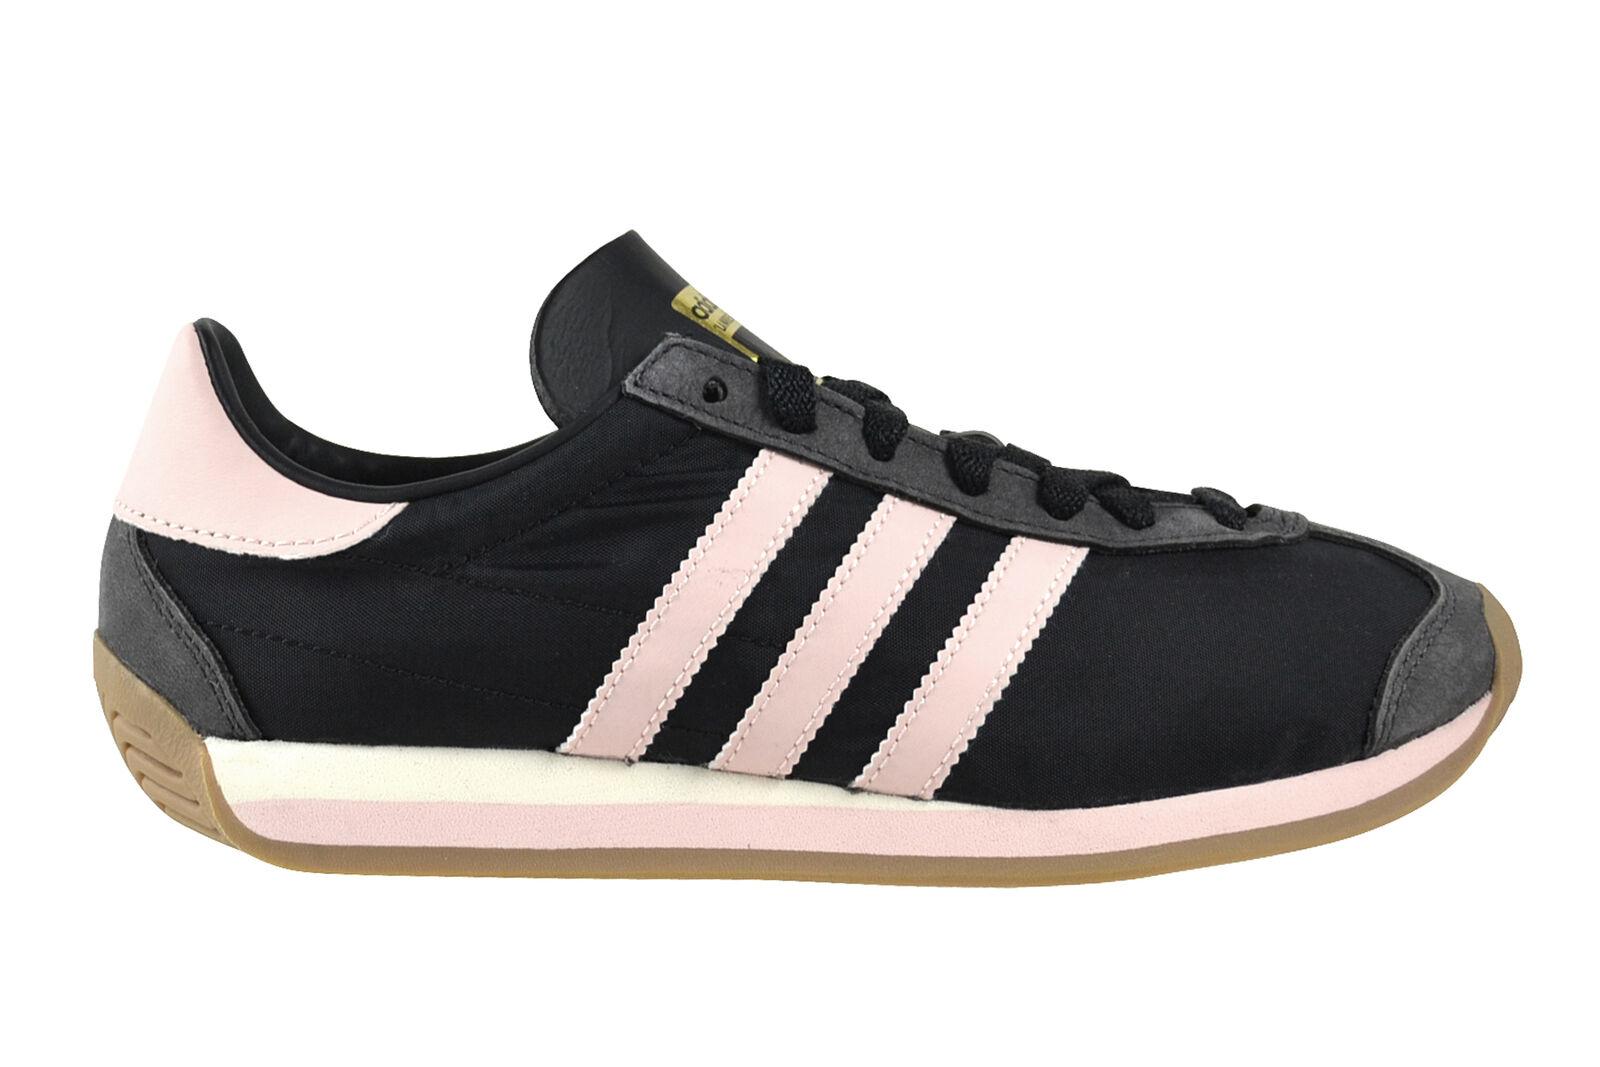 Adidas Pays Og Femmes Noir Rose gum4 Chaussures Noir S32203